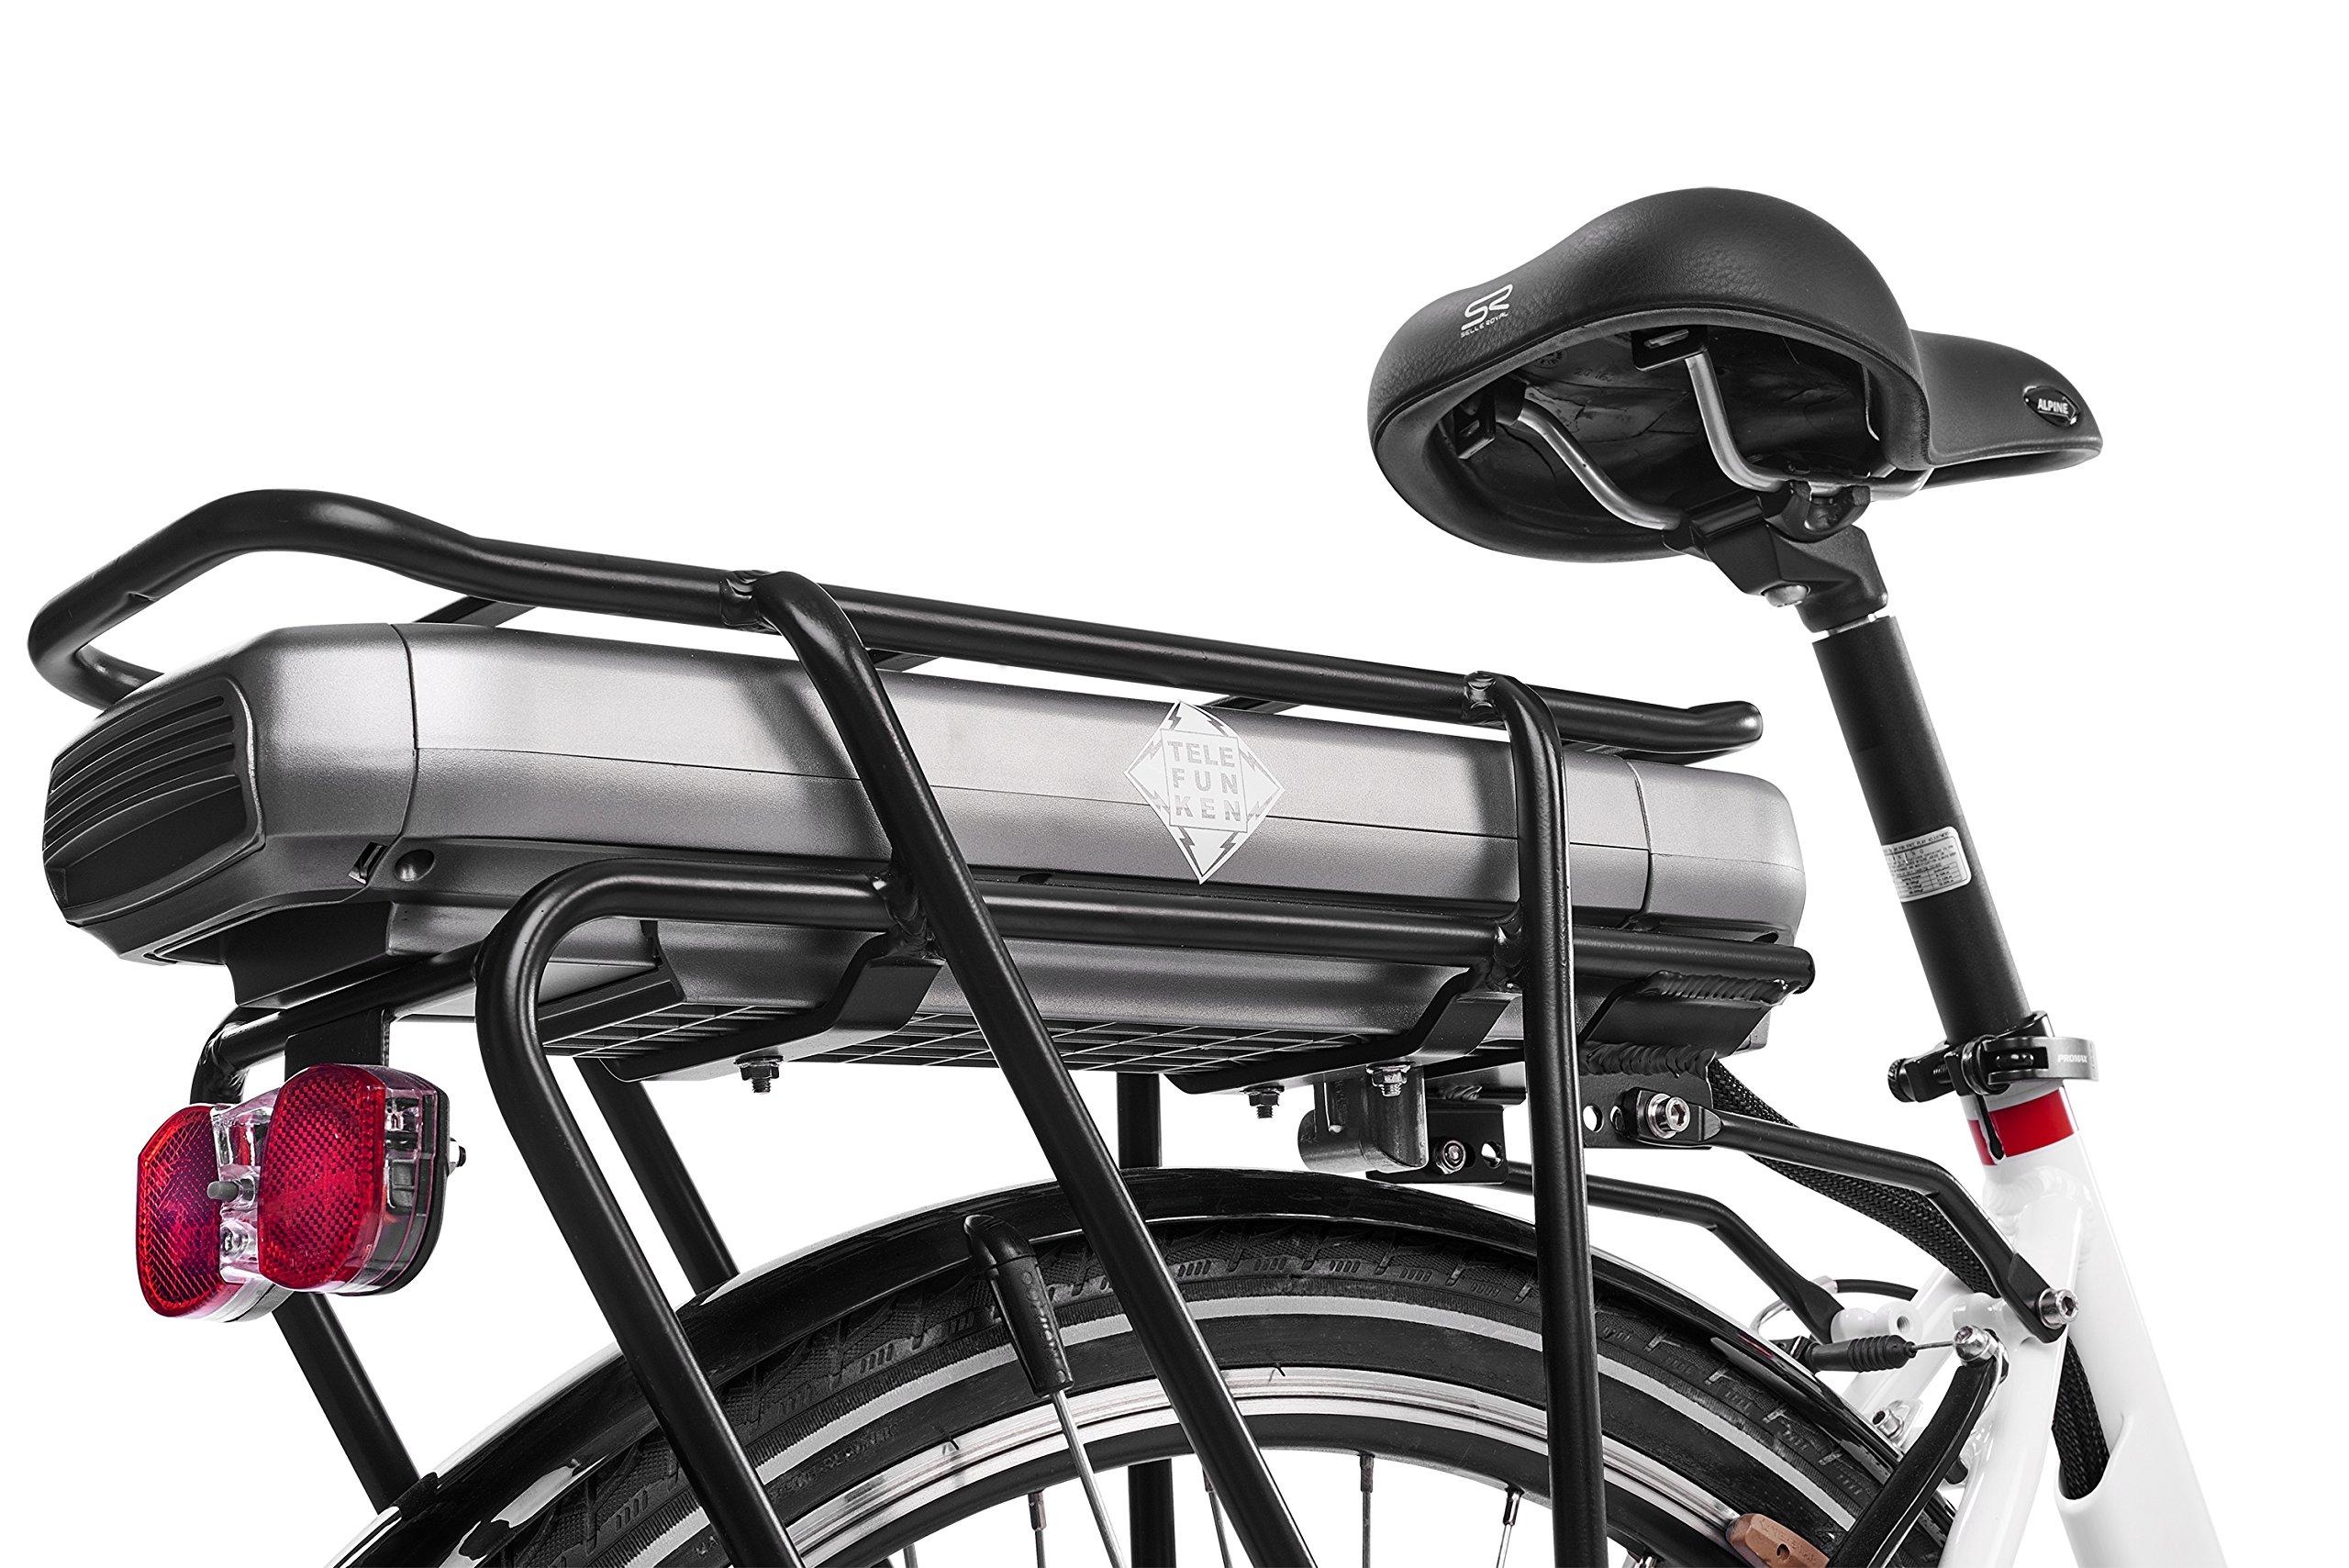 Telefunken E Bike Elektrofahrrad Alu, mit 7 Gang Shimano